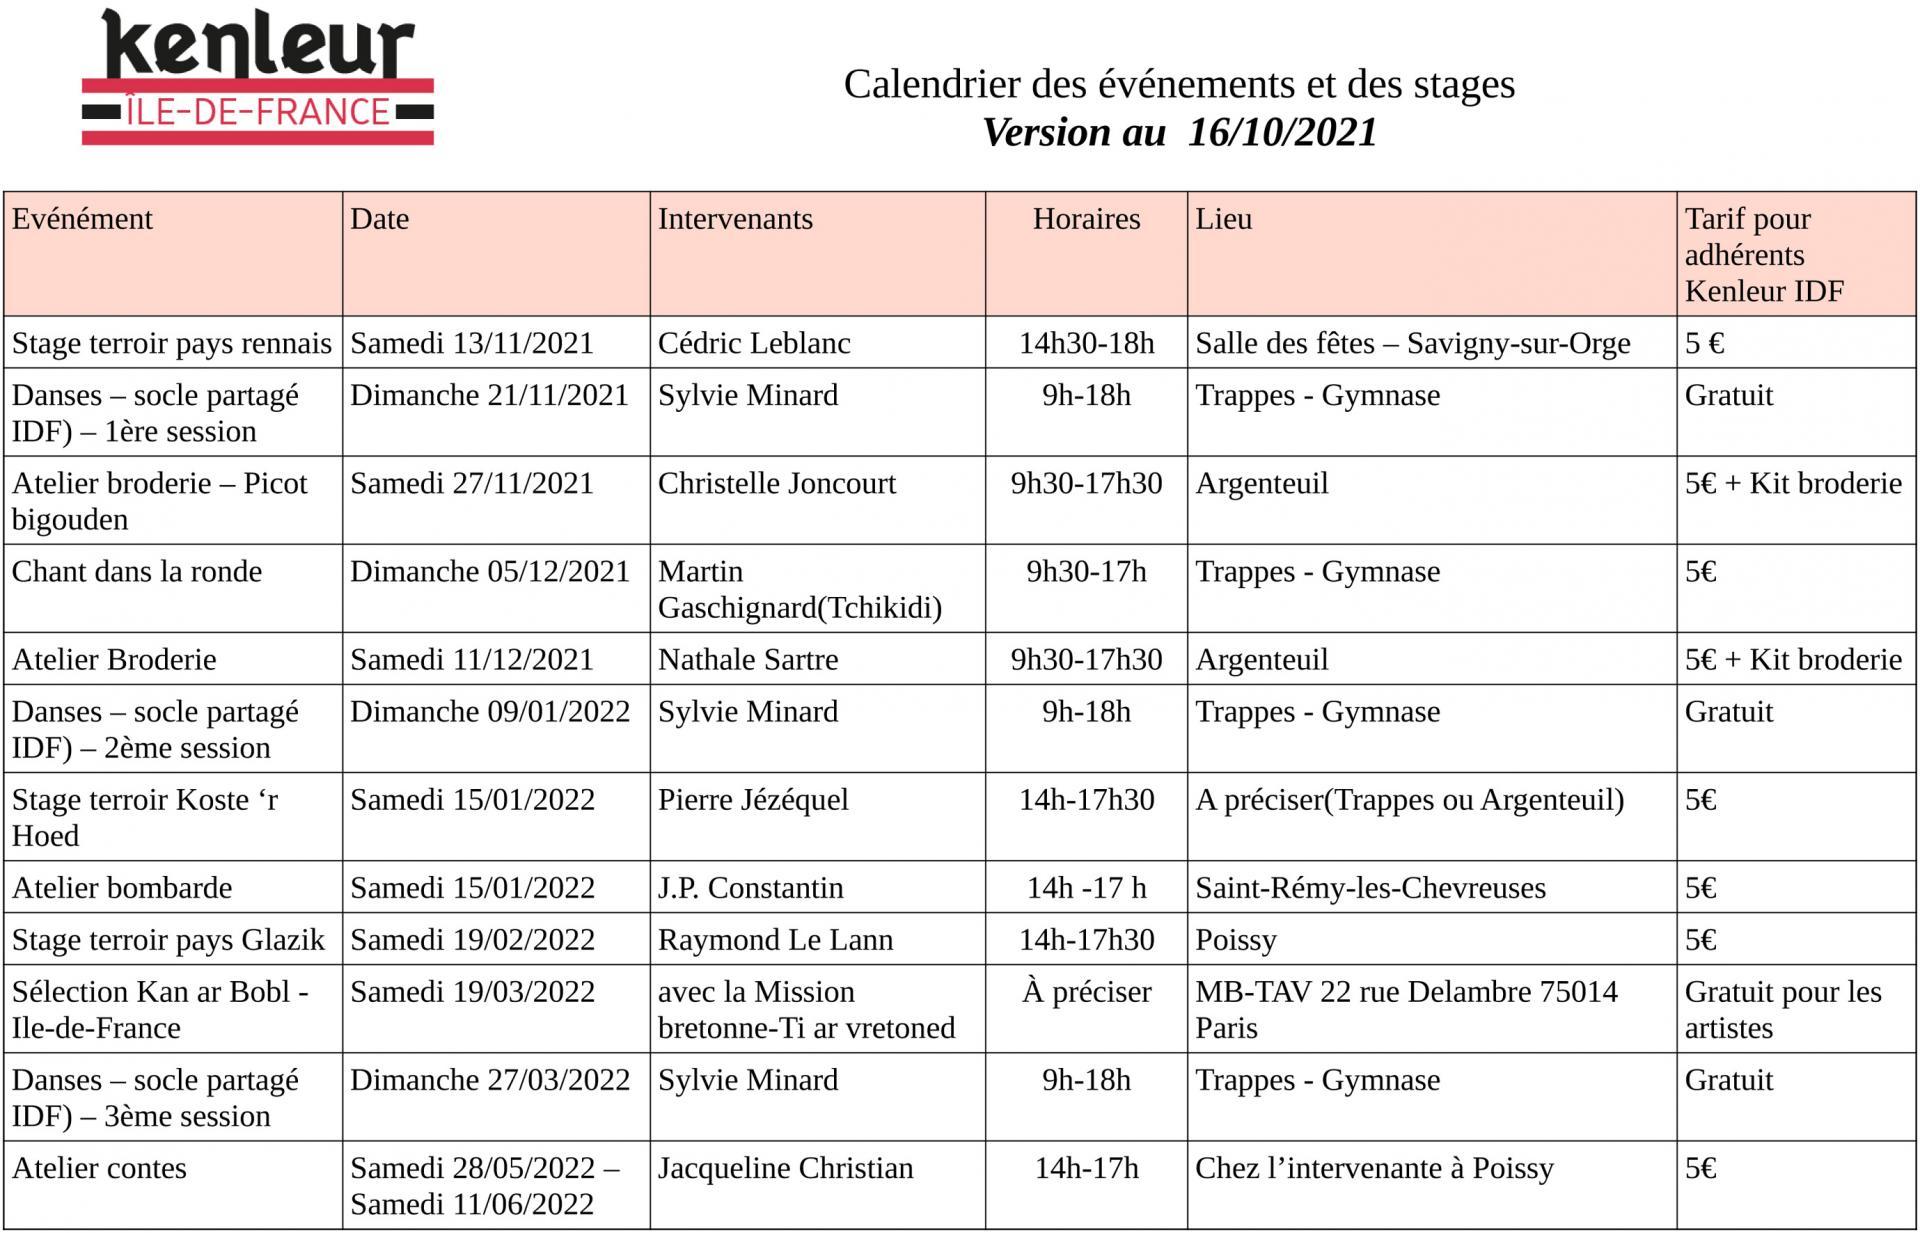 16102021 calendrier stages kidf 2021 2022 avec tarif adherents kidf